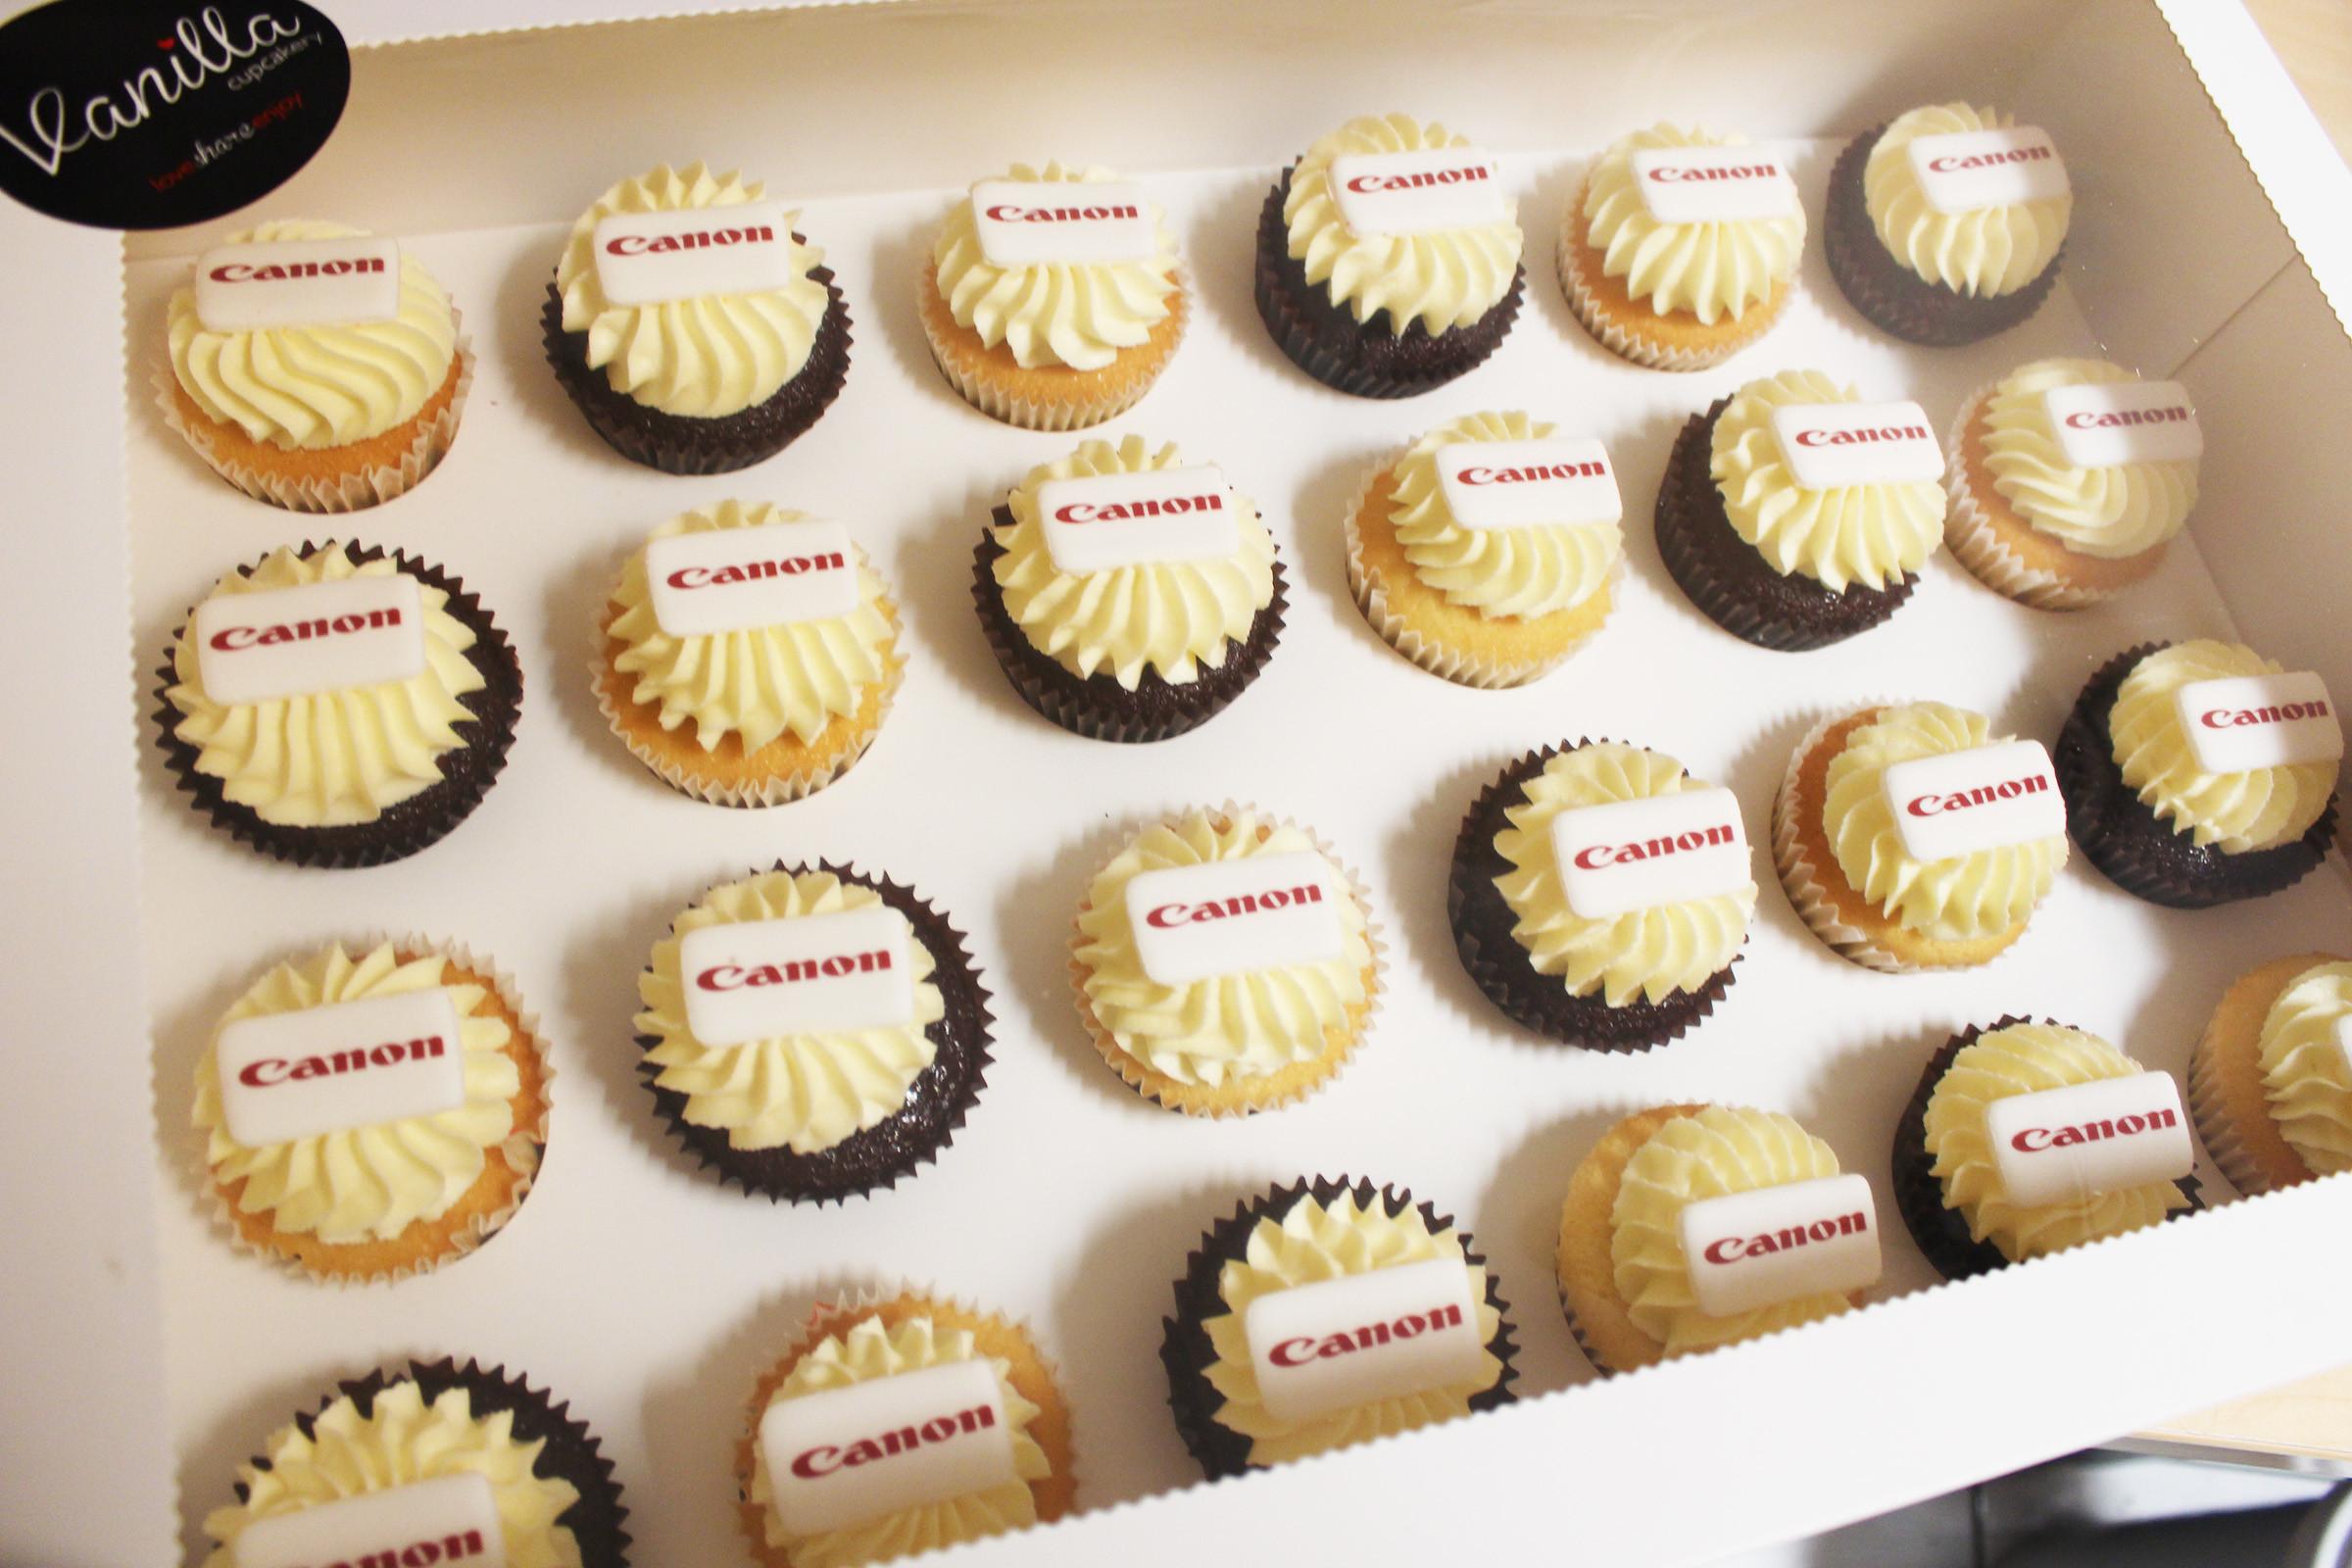 Canon corporate cupcakes